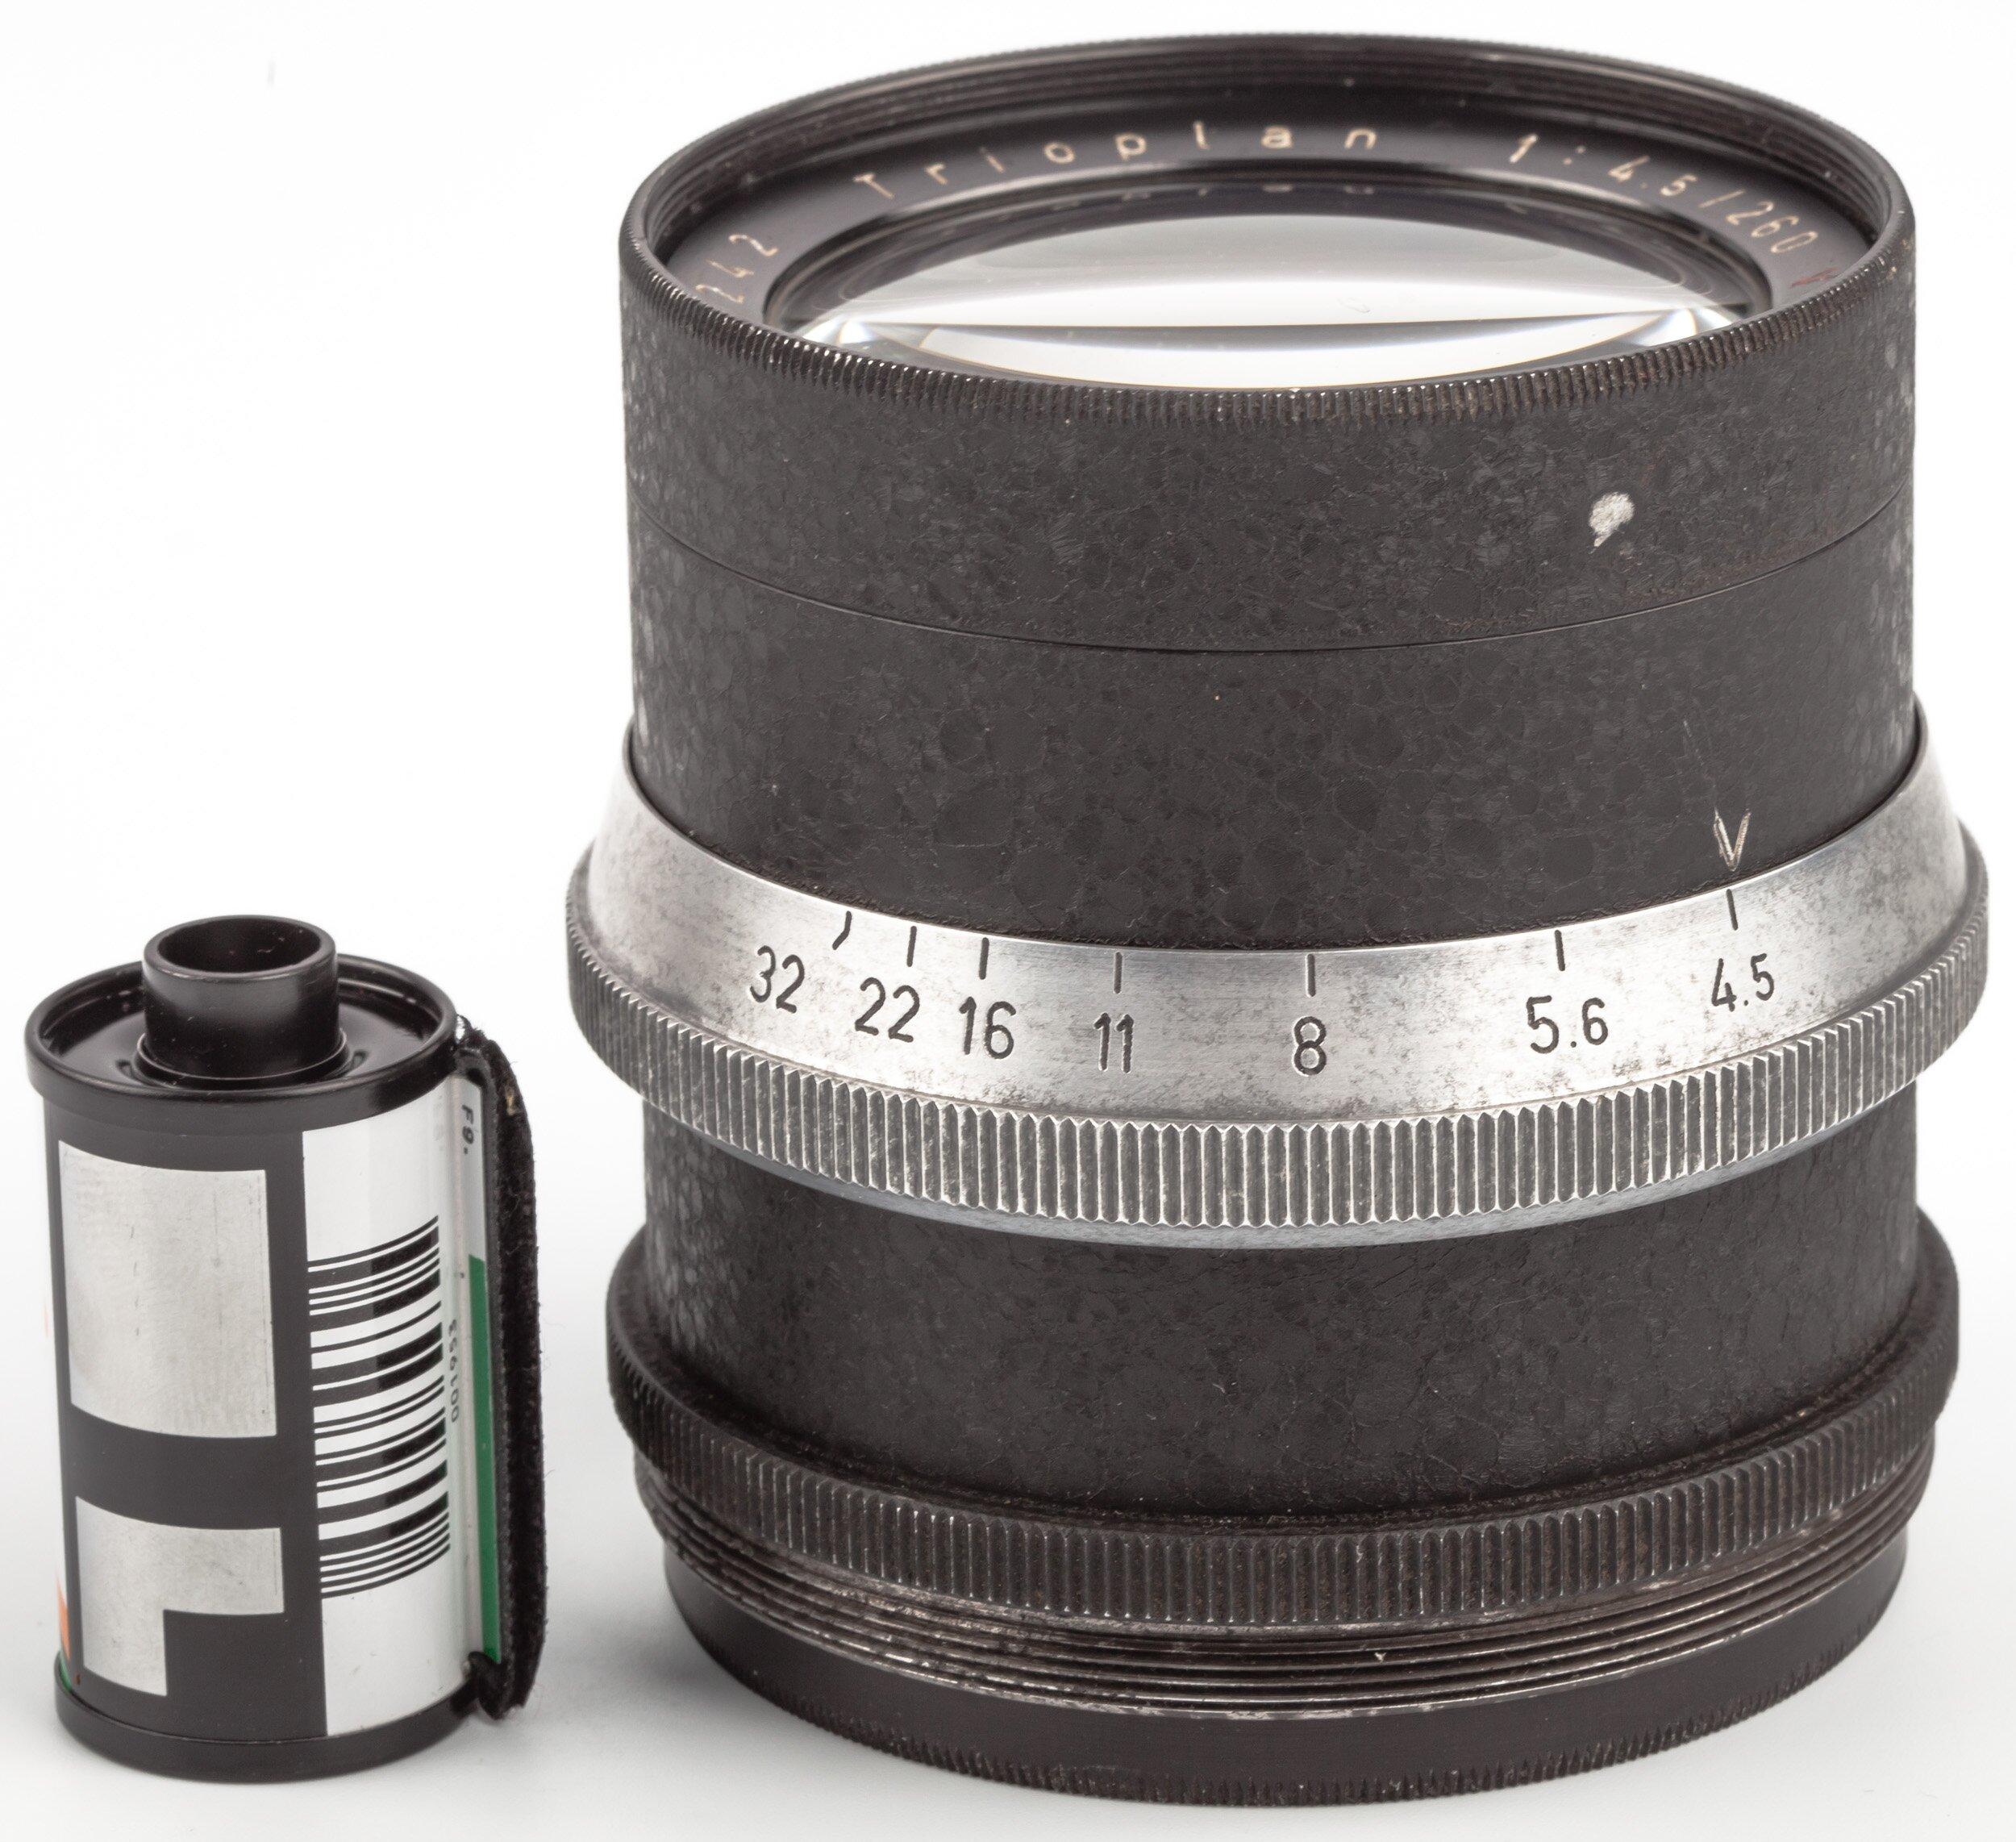 Meyer-Optik Görlitz 260mm 4,5 Trioplan V